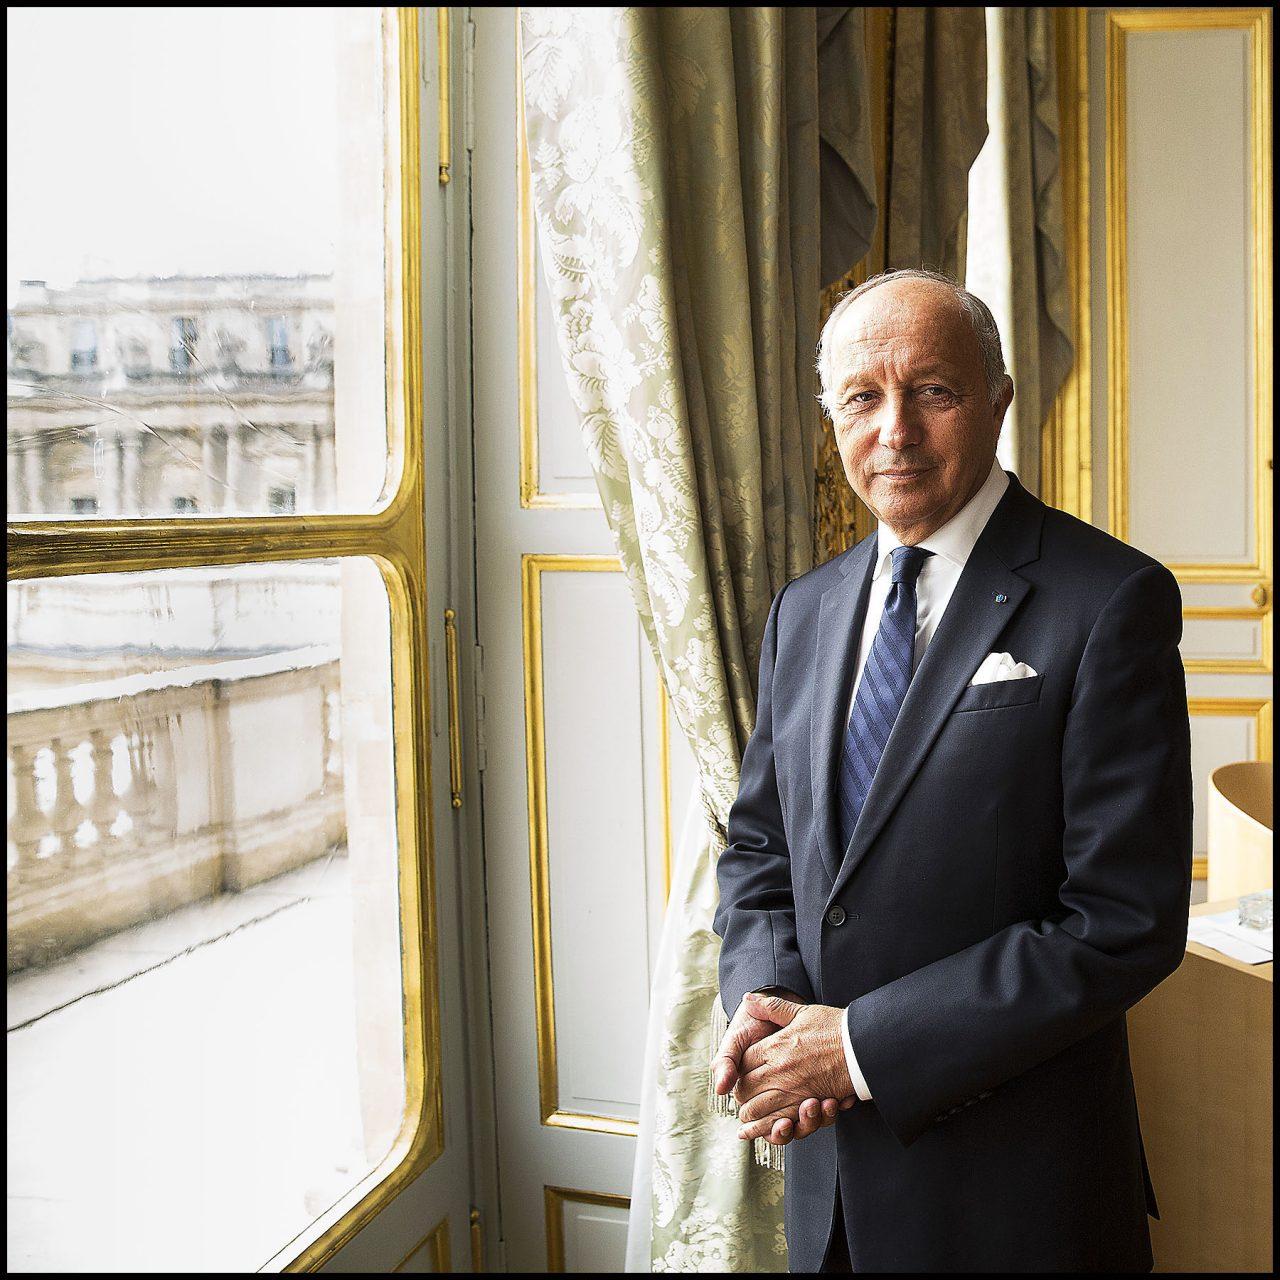 Laurent FABIUS, Président du Conseil Constitutionnel